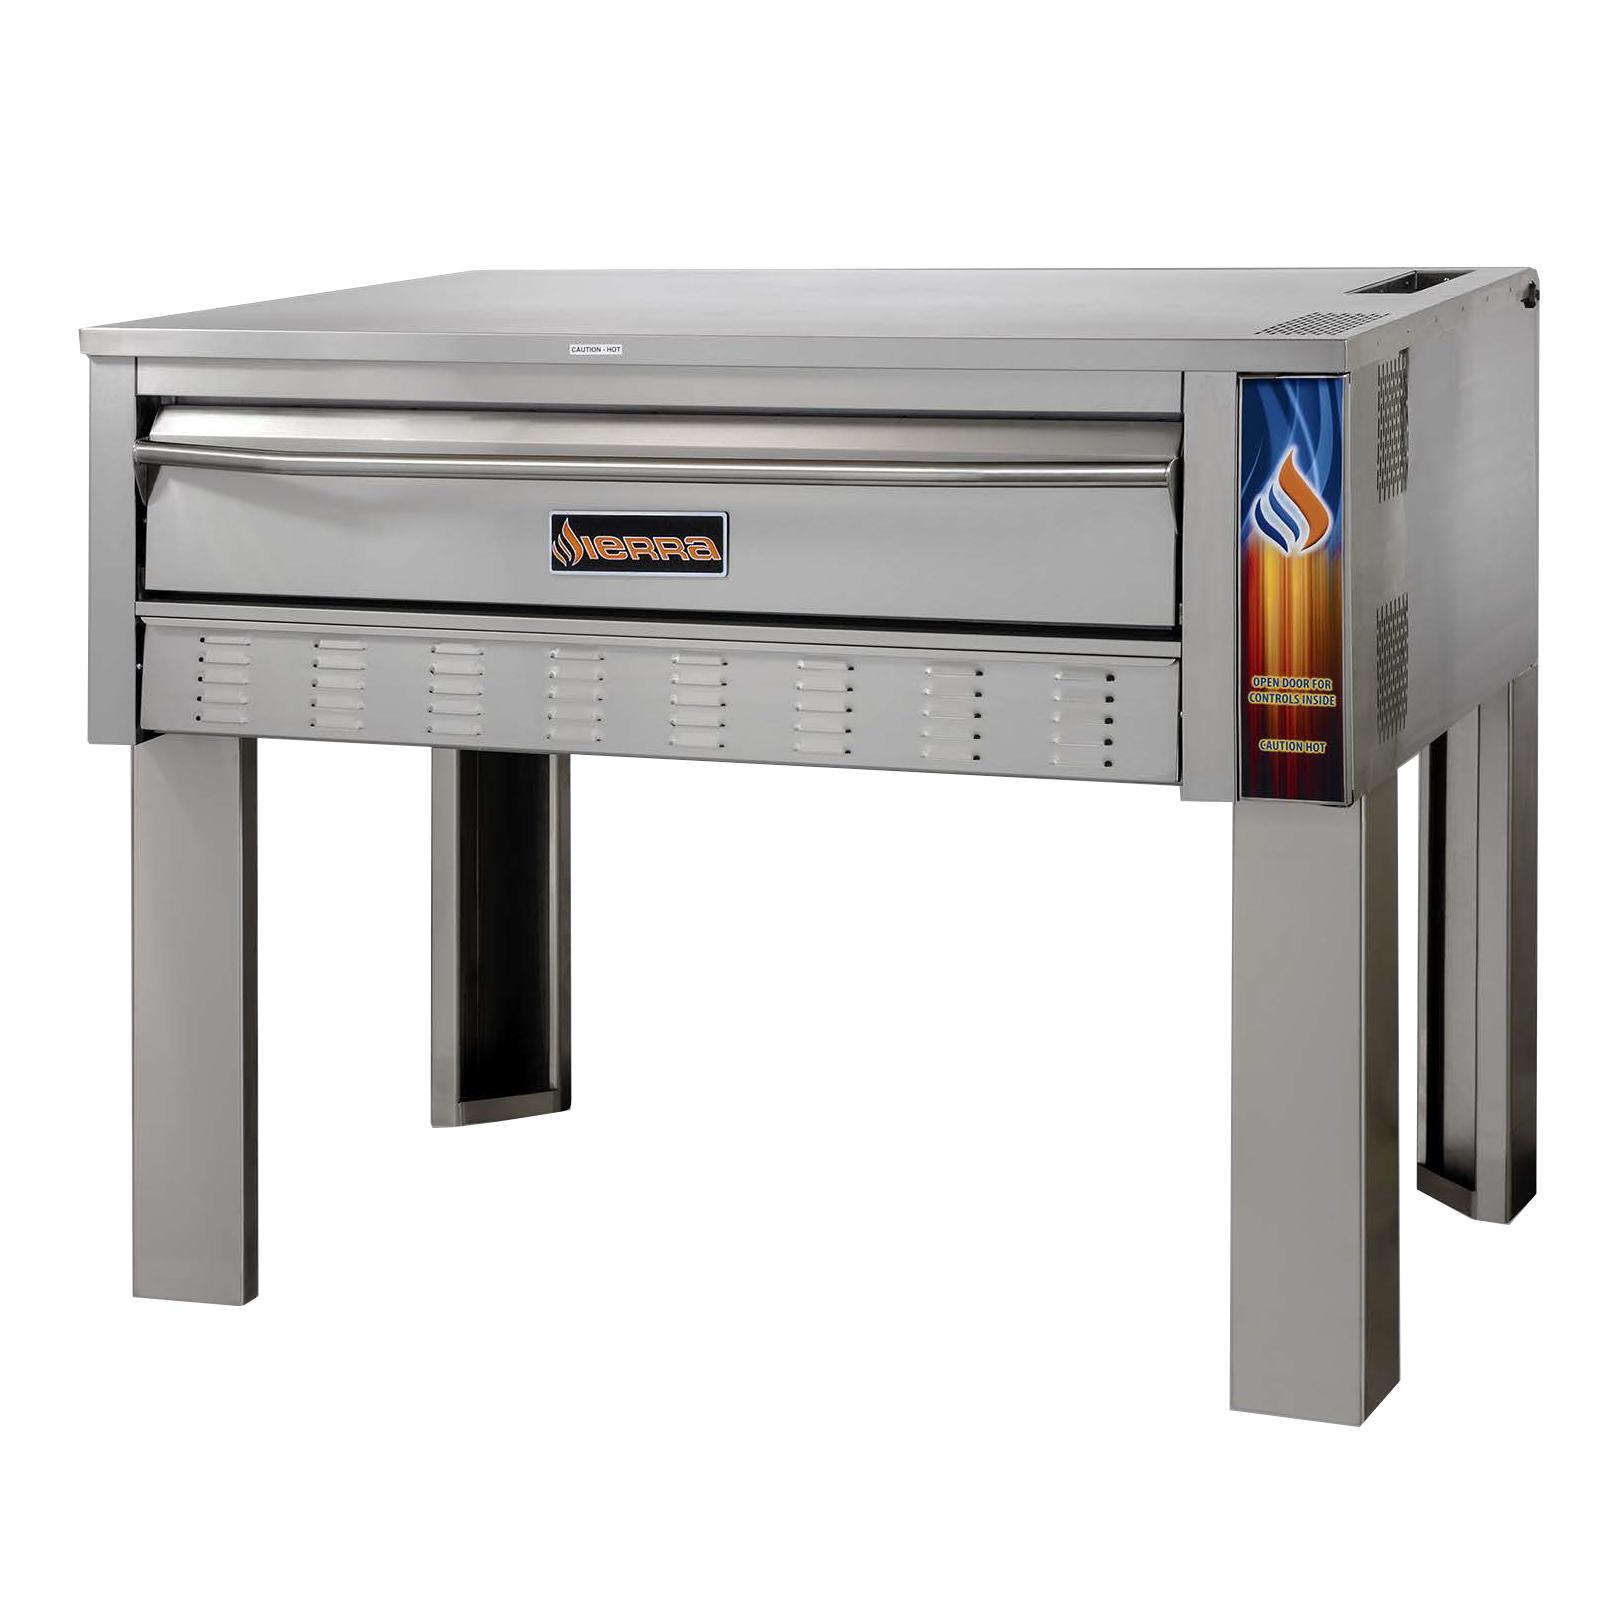 MVP SRPO-60G pizza bake oven, deck-type, gas